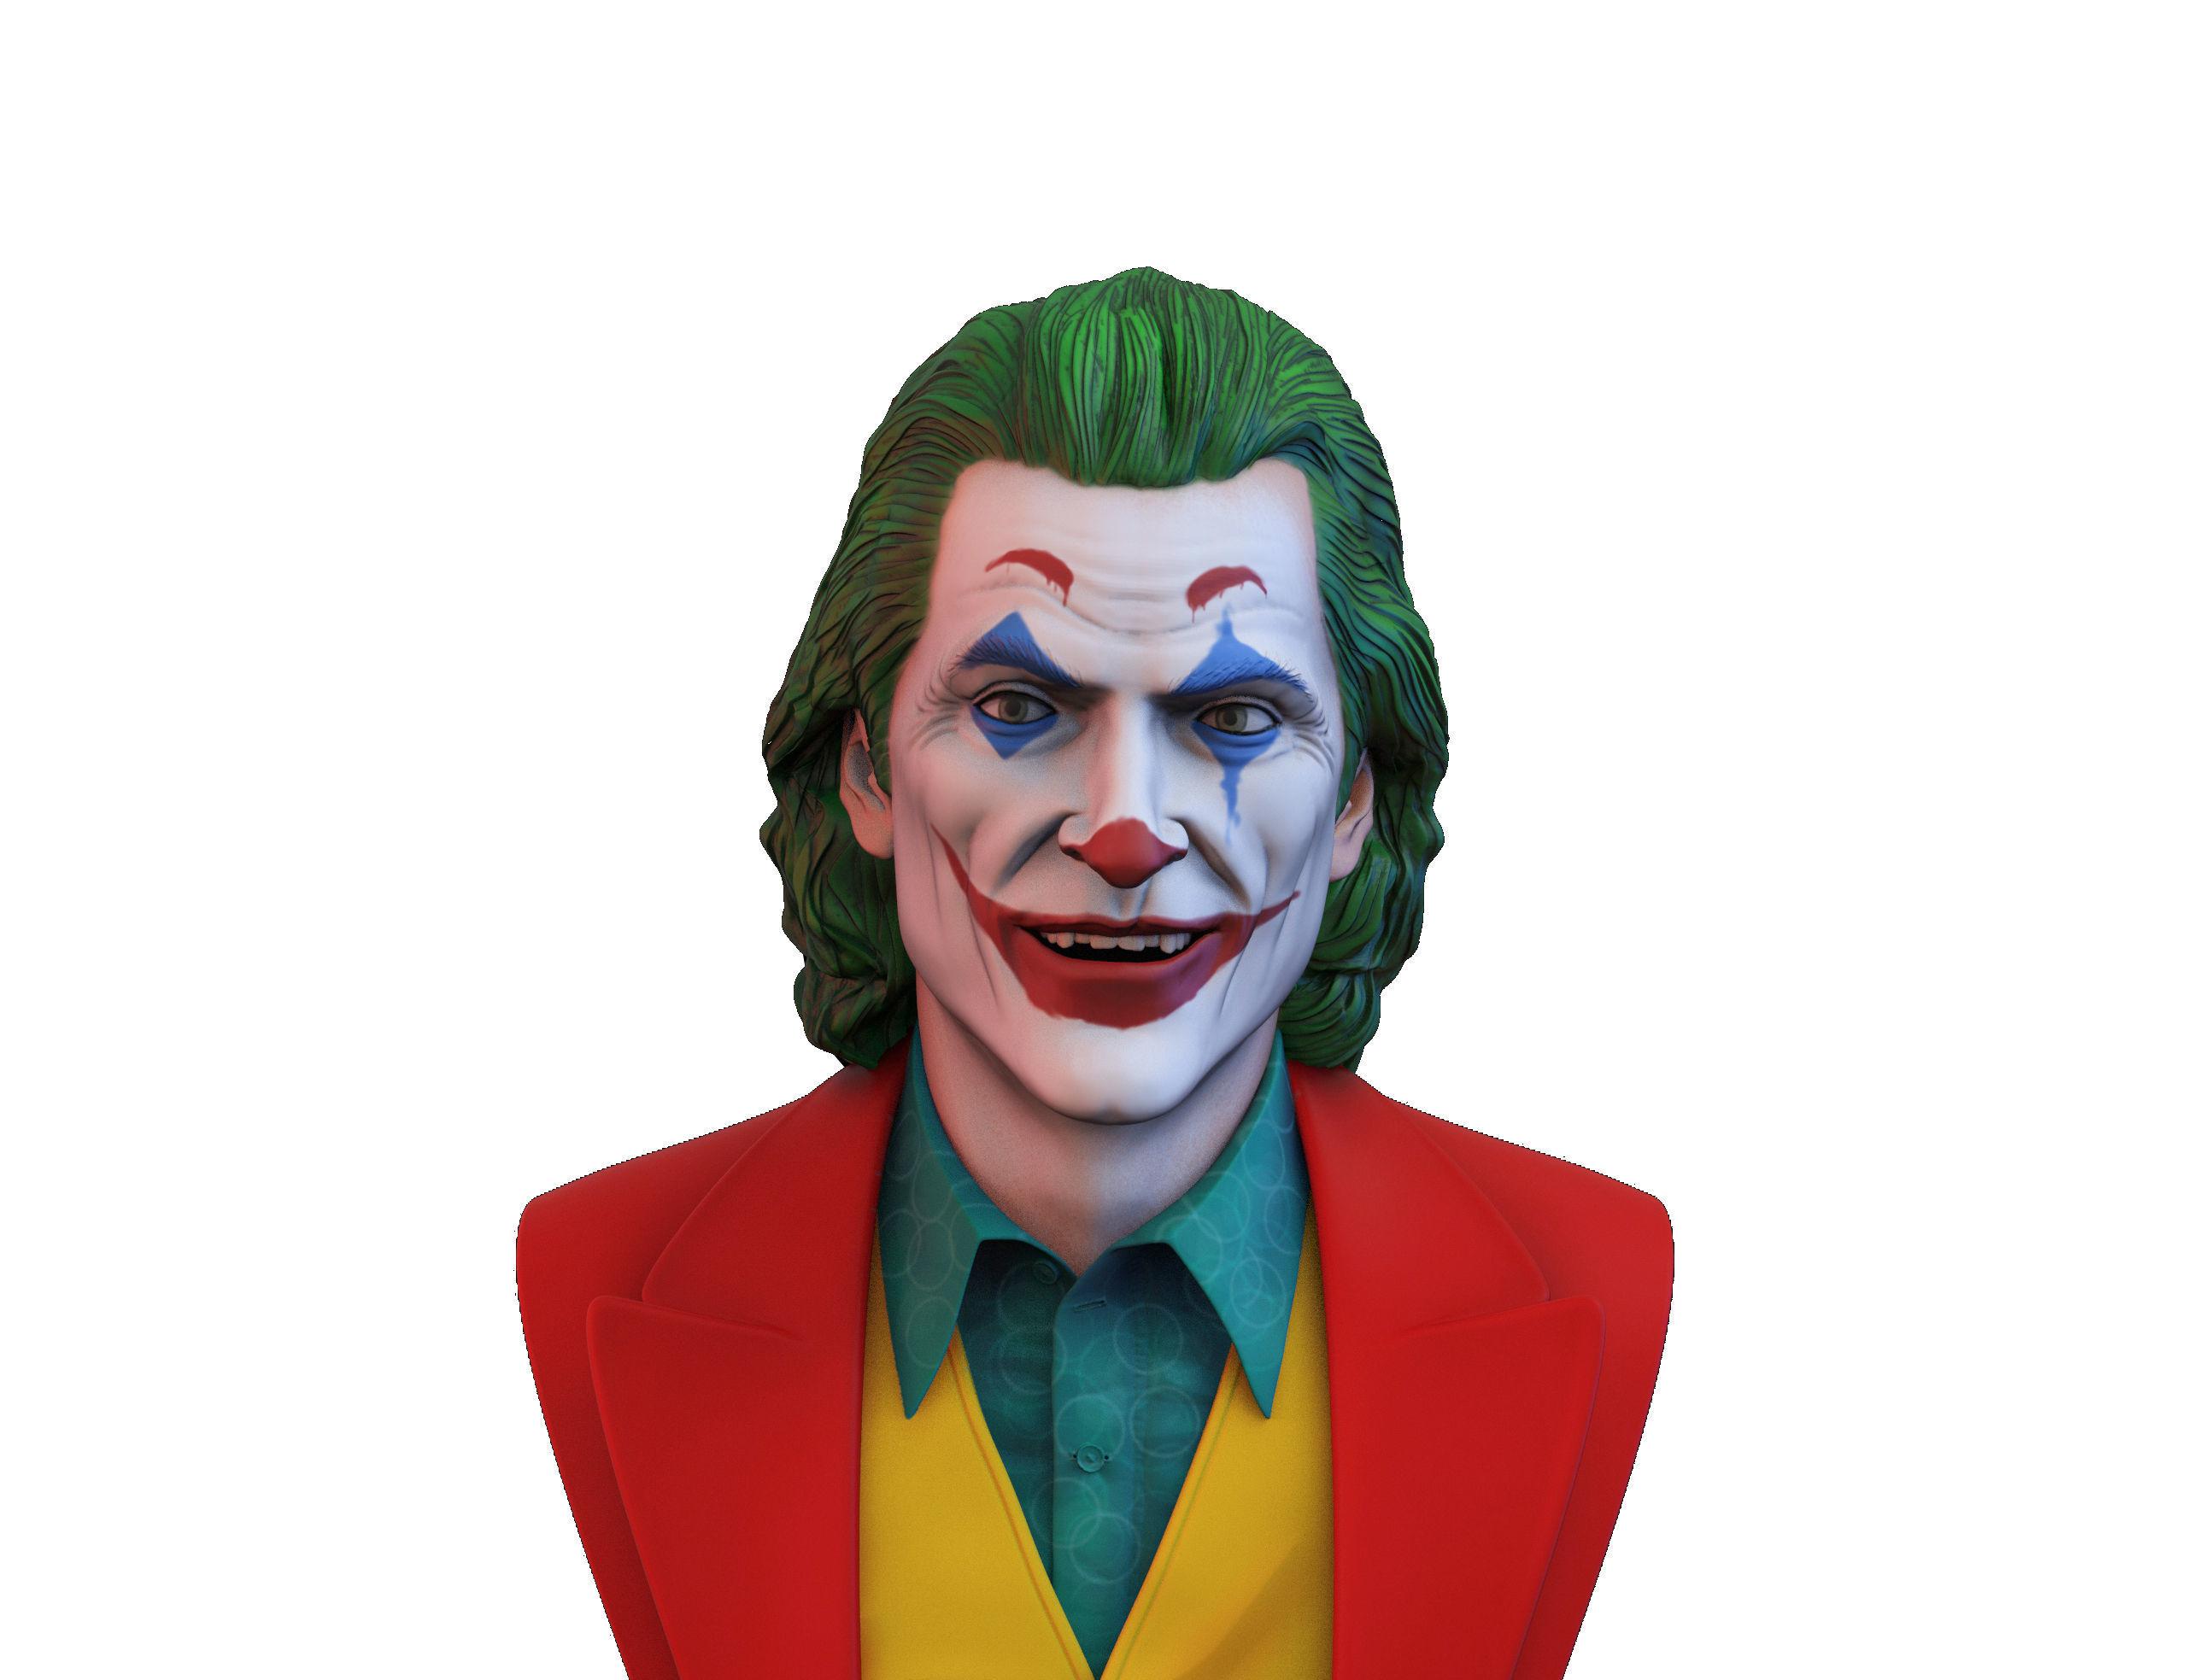 Joker 2019 Joaquin Phoenix bust